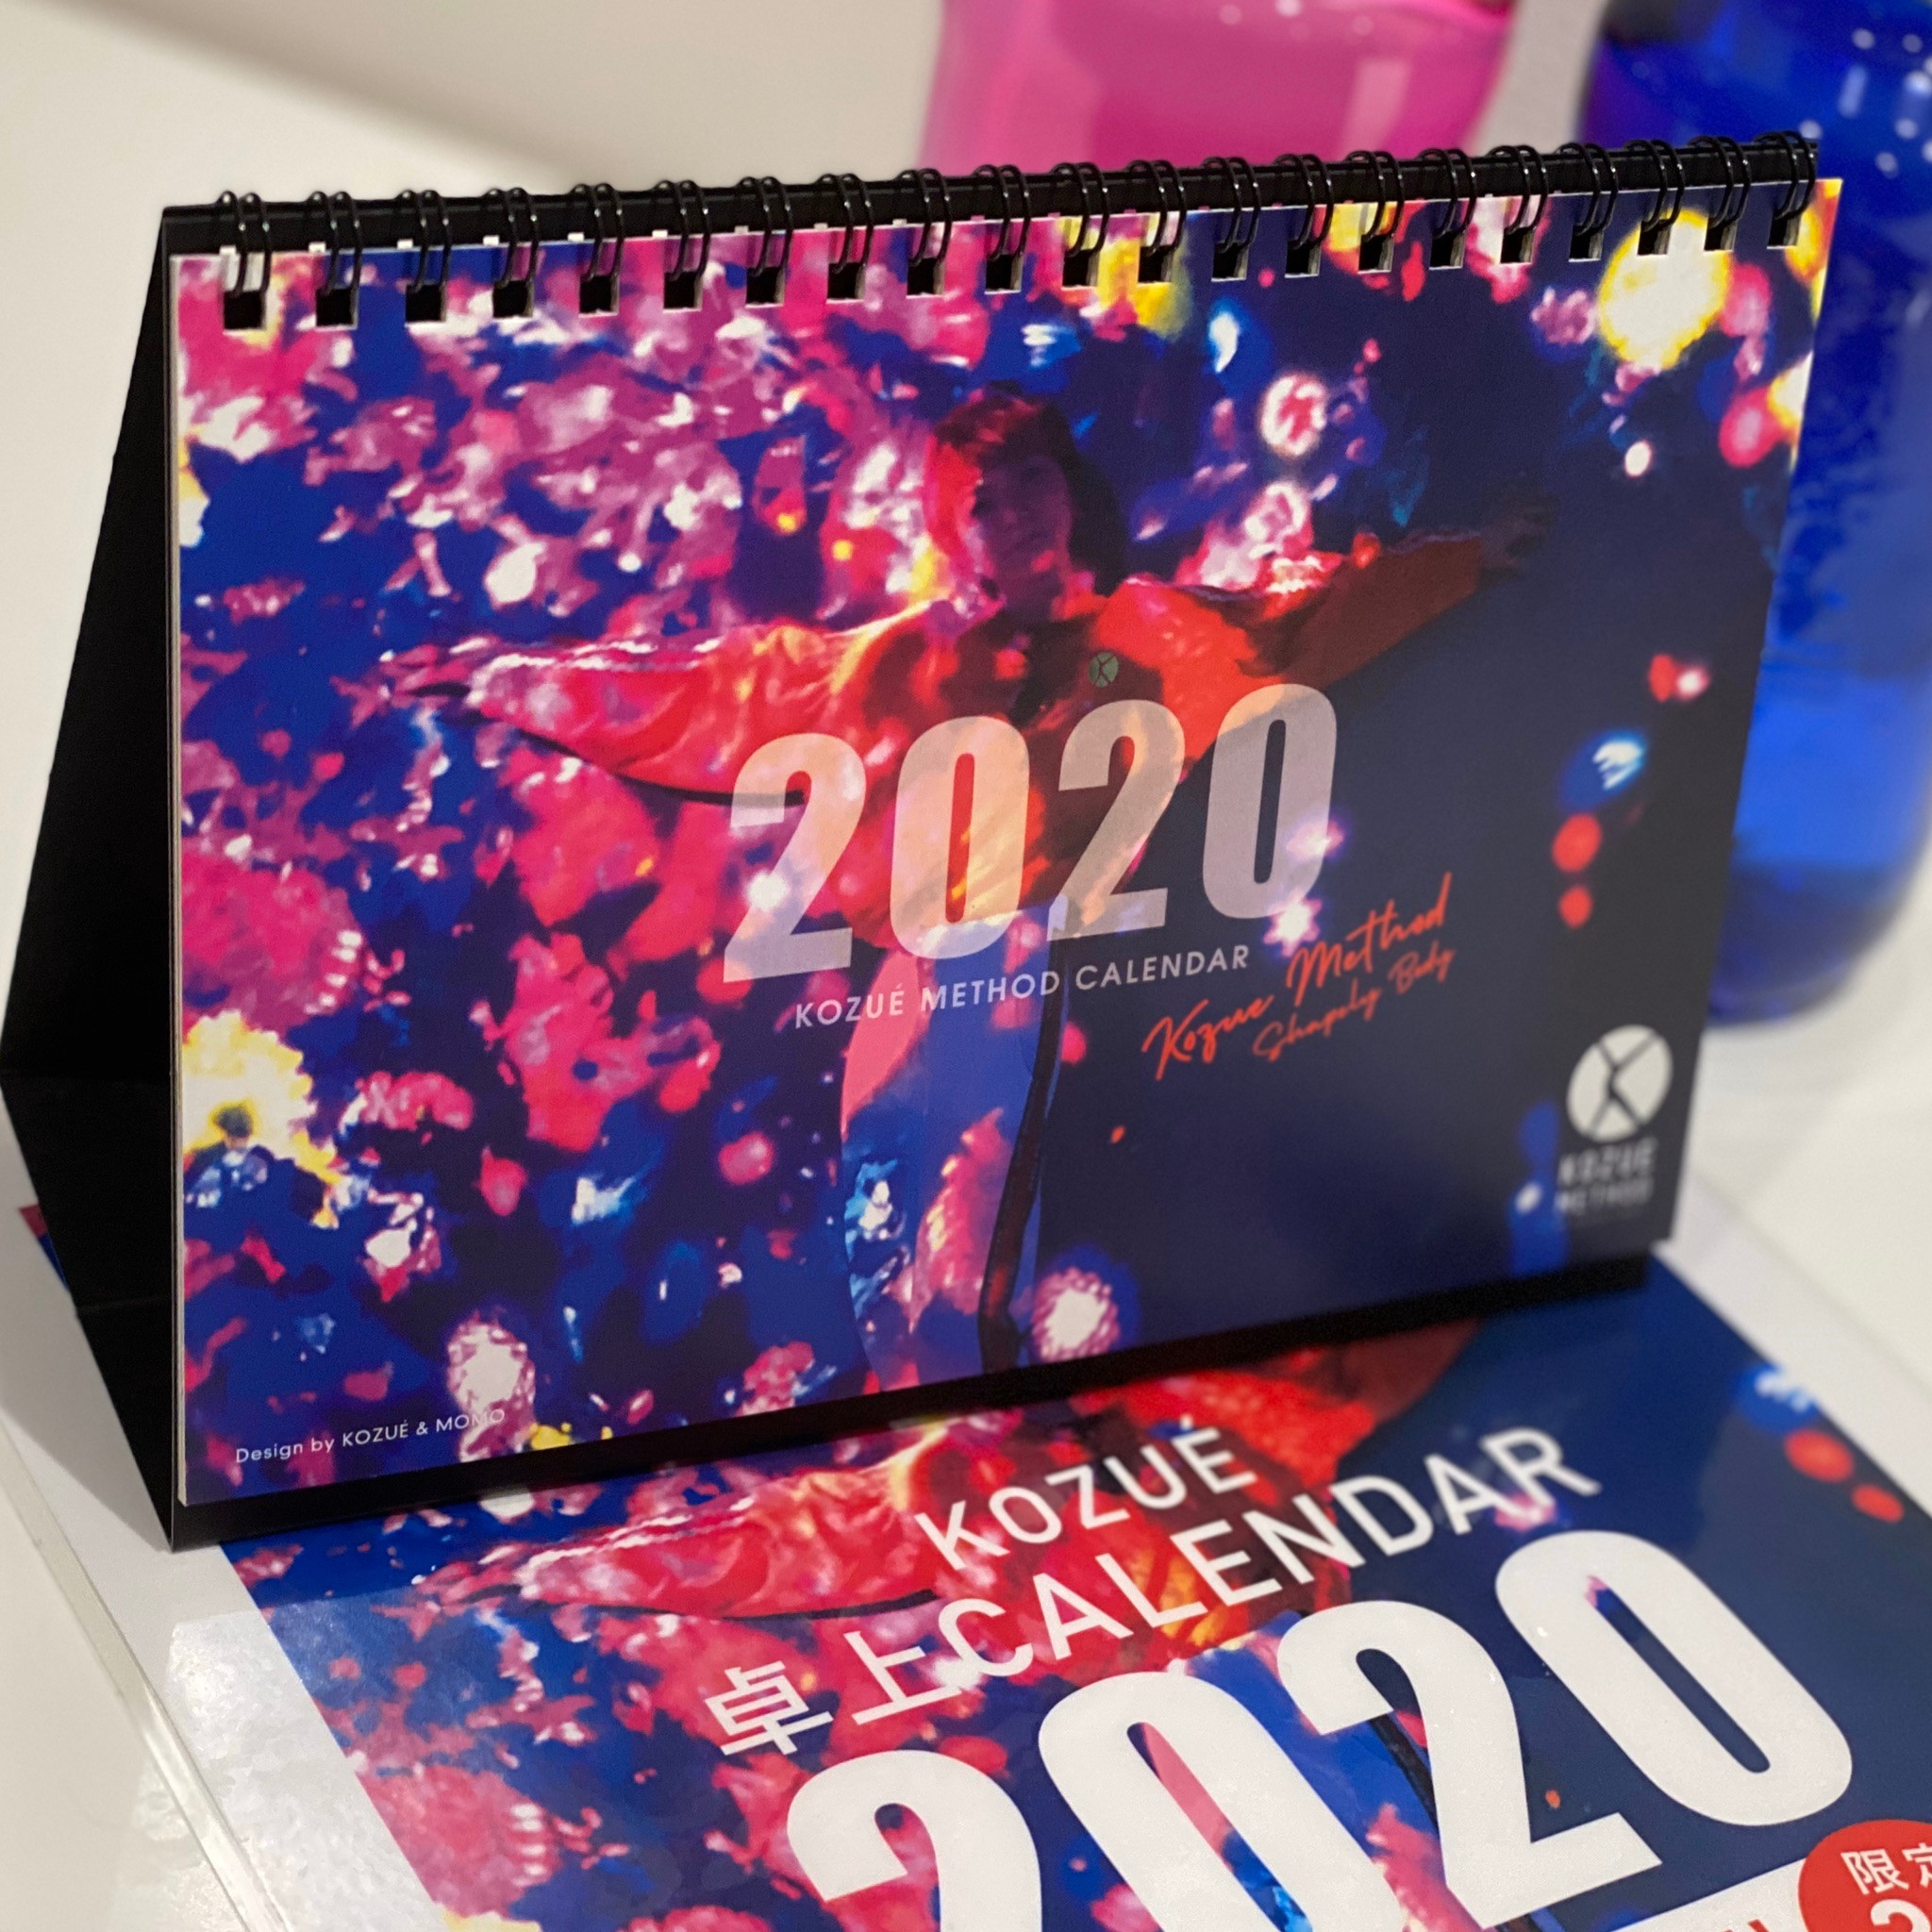 「KOZUE 卓上CALENDAR 2020」の予約のお知らせです。